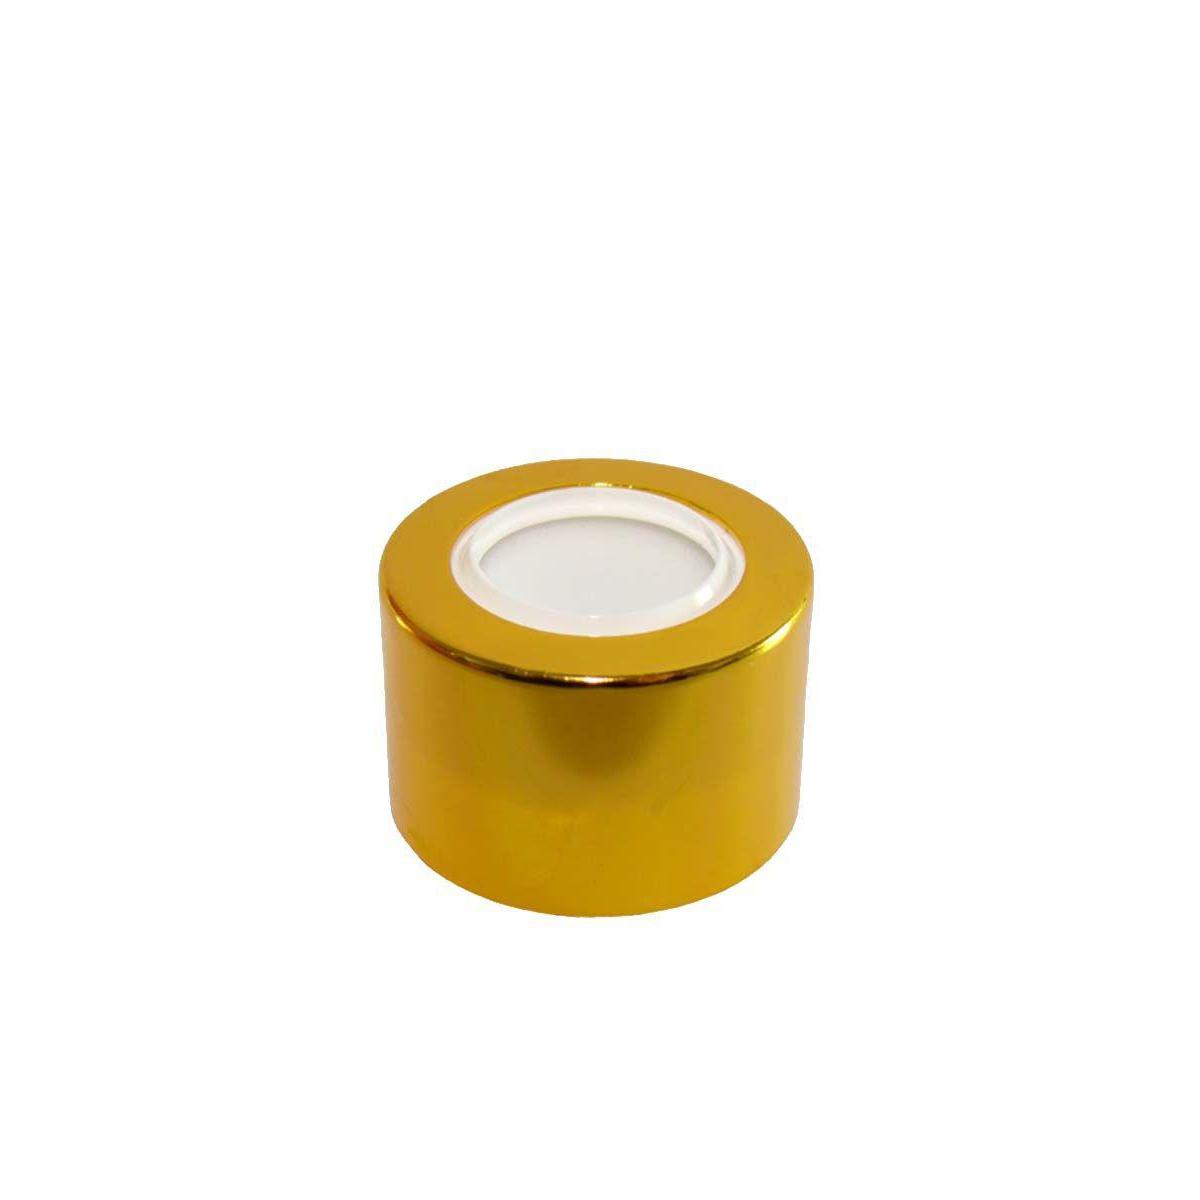 Tampa Difusora Luxo 28/410 Cromada Dourada